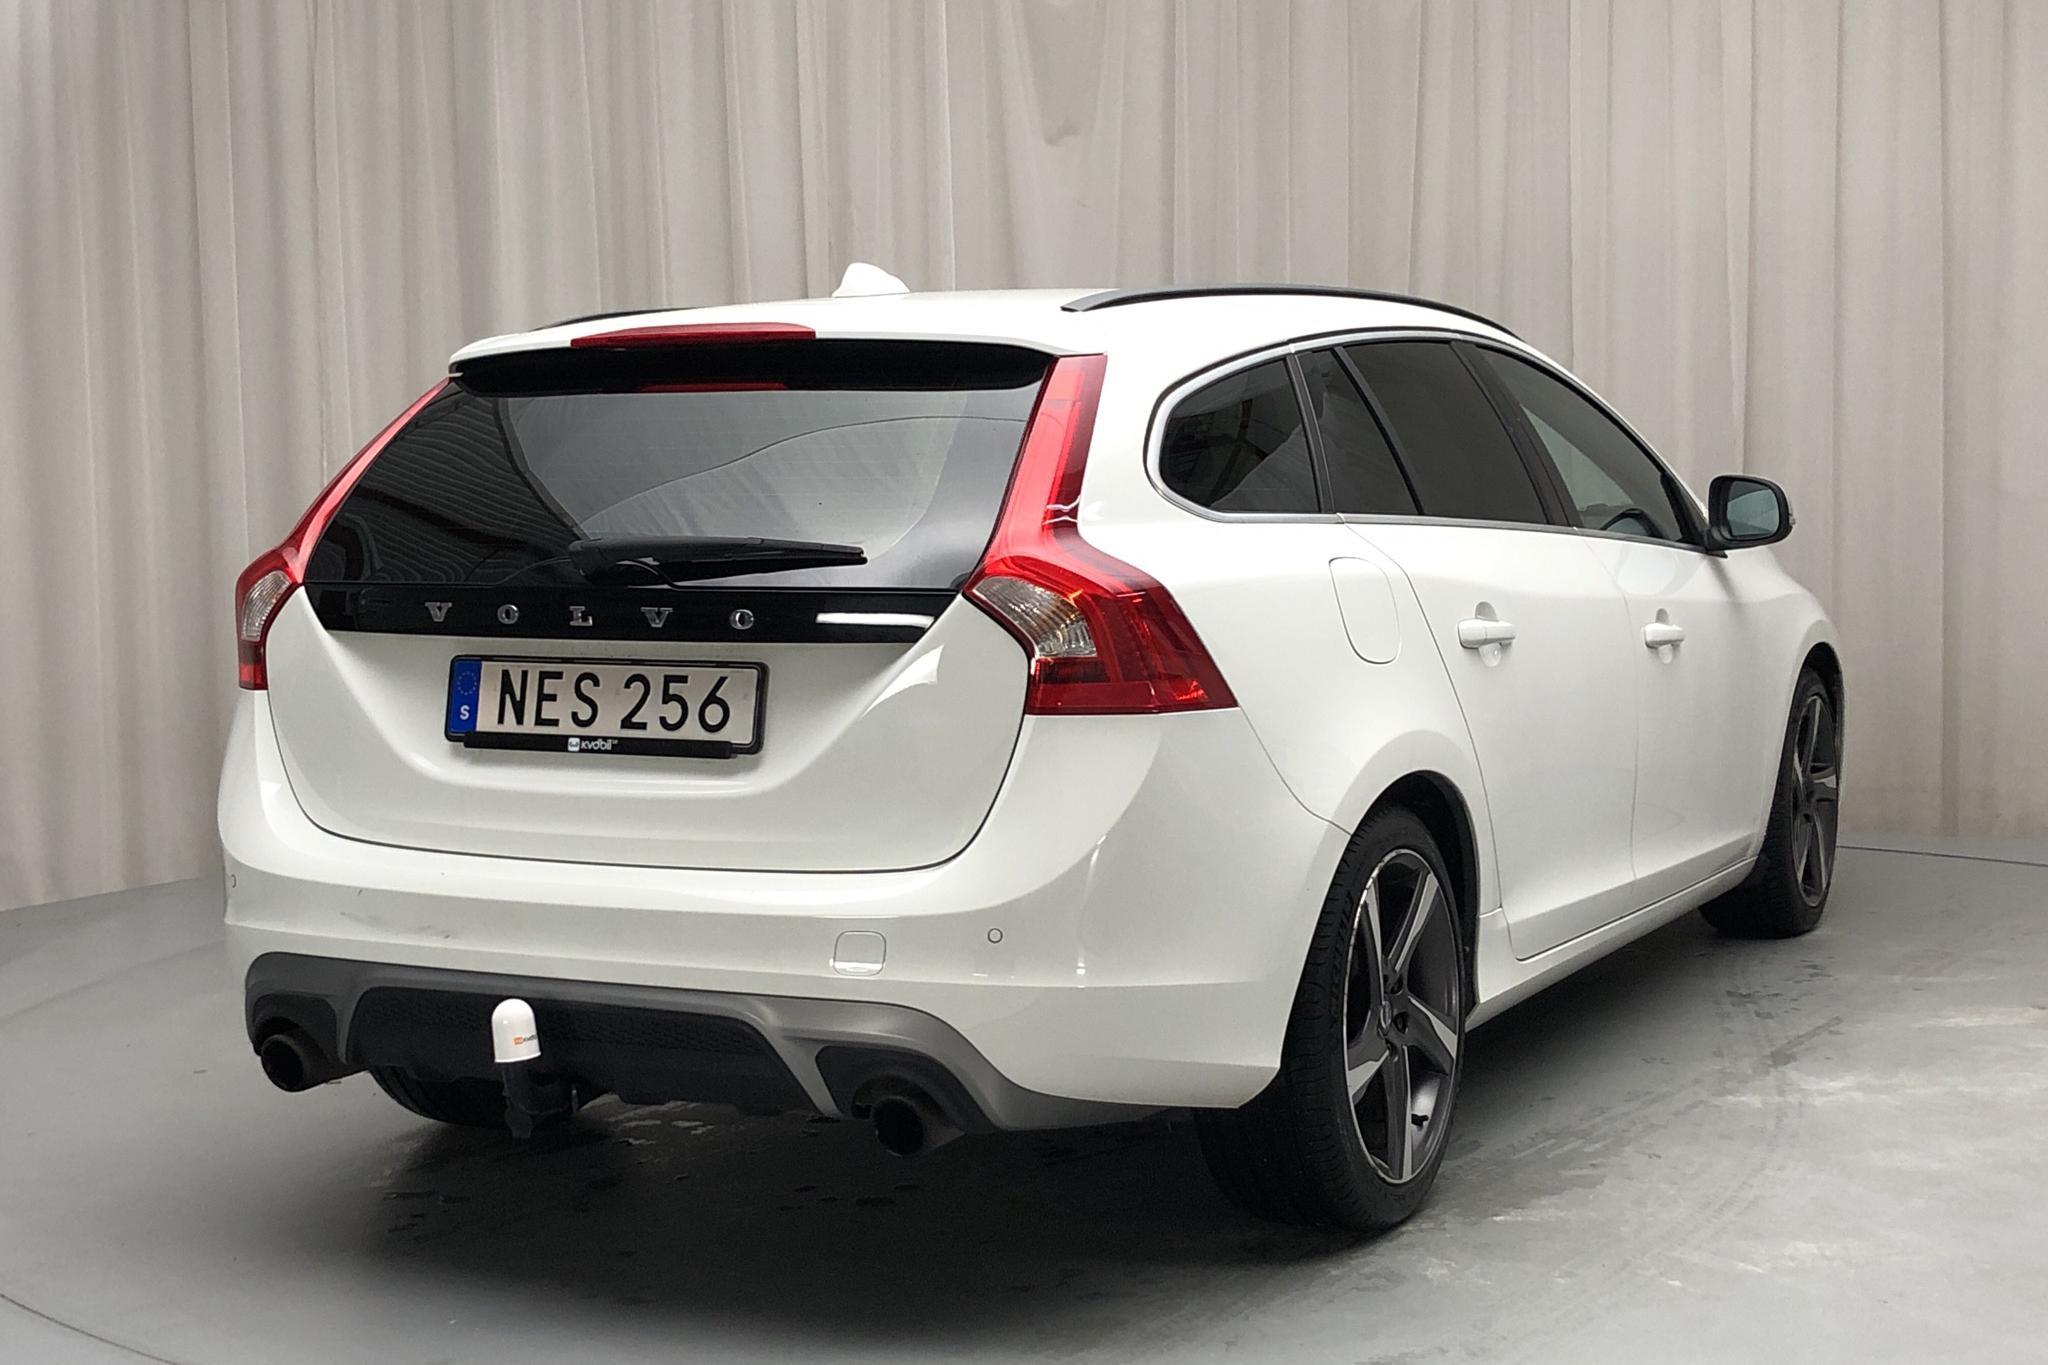 Volvo V60 T4 (190hk) - 8 594 mil - Manuell - vit - 2016